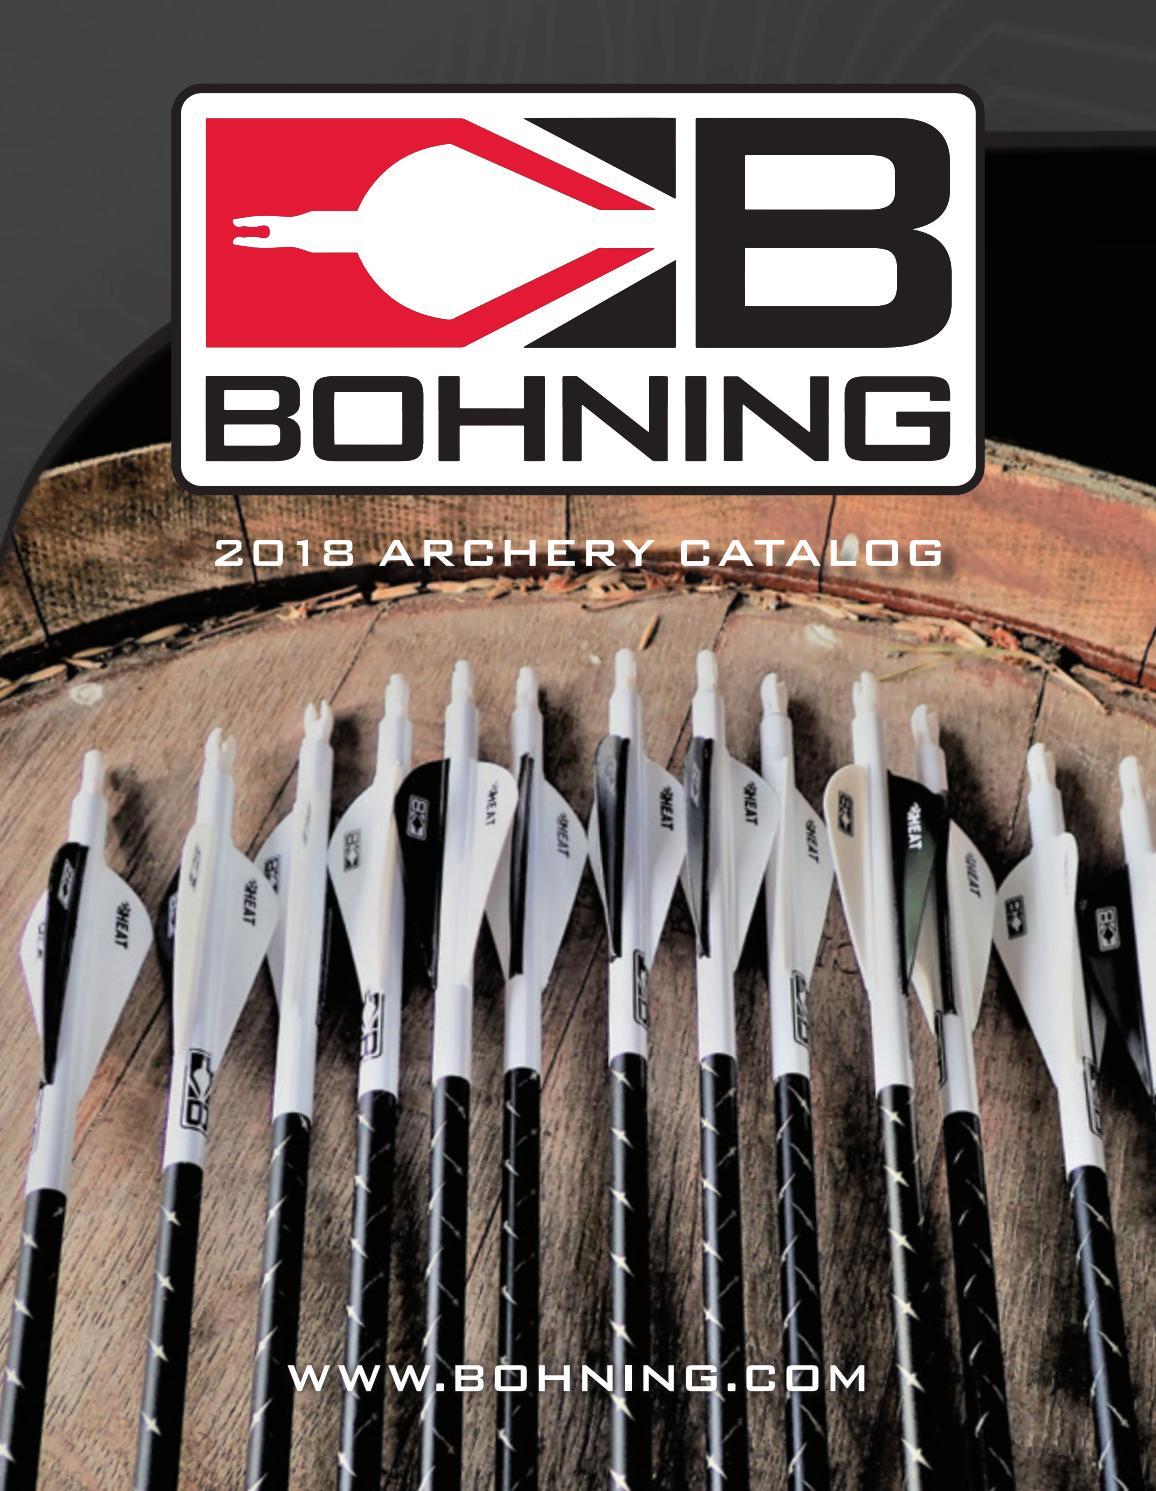 Bohning Archery Premium Feather Fletching Tape Free Shipping